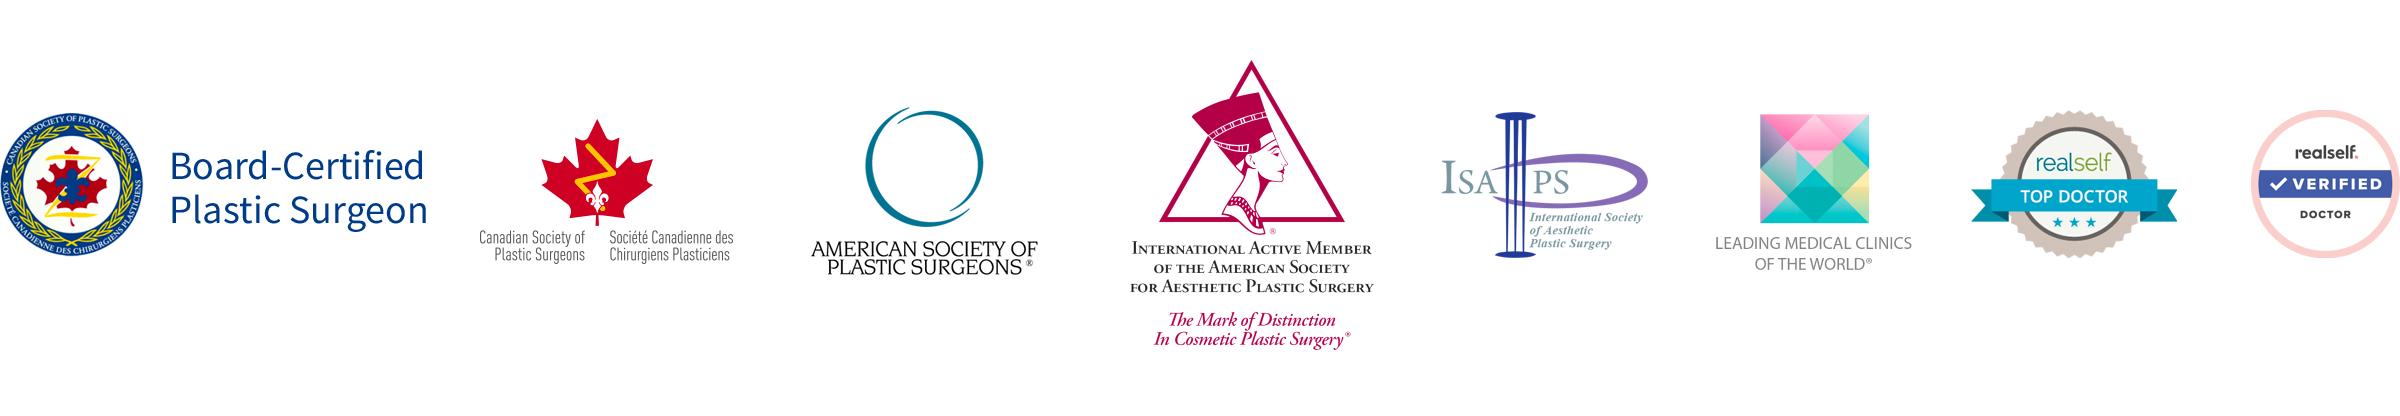 Board-Certified Toronto Plastic Surgeon, Member of CSPS, ASPS, ASAPS, ISAPS